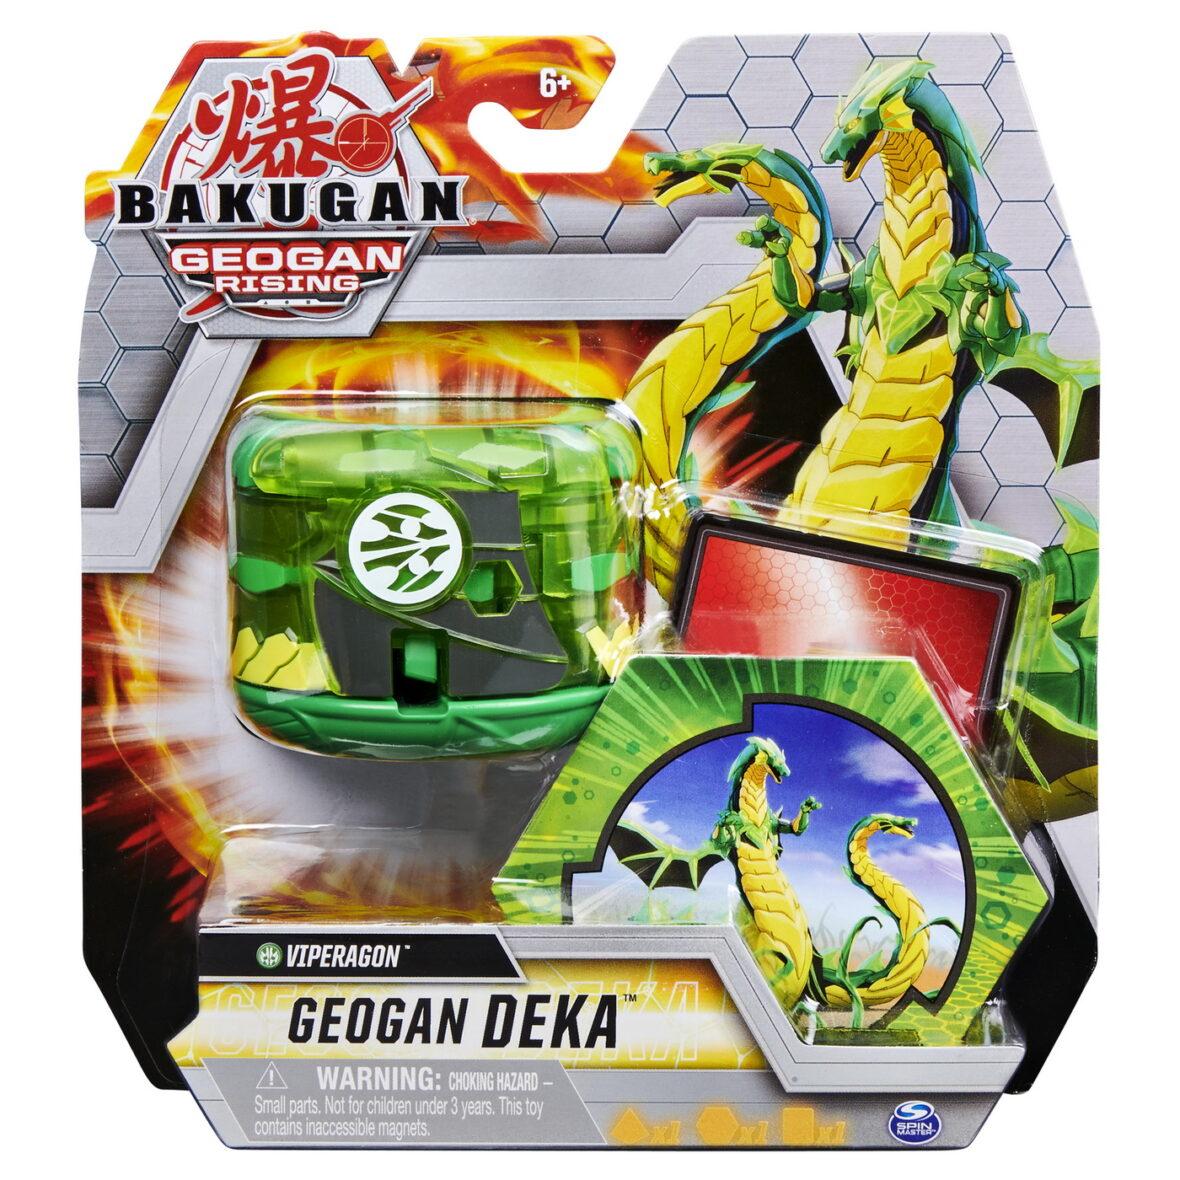 Bakugan S3 Geogan Deka Viperagon